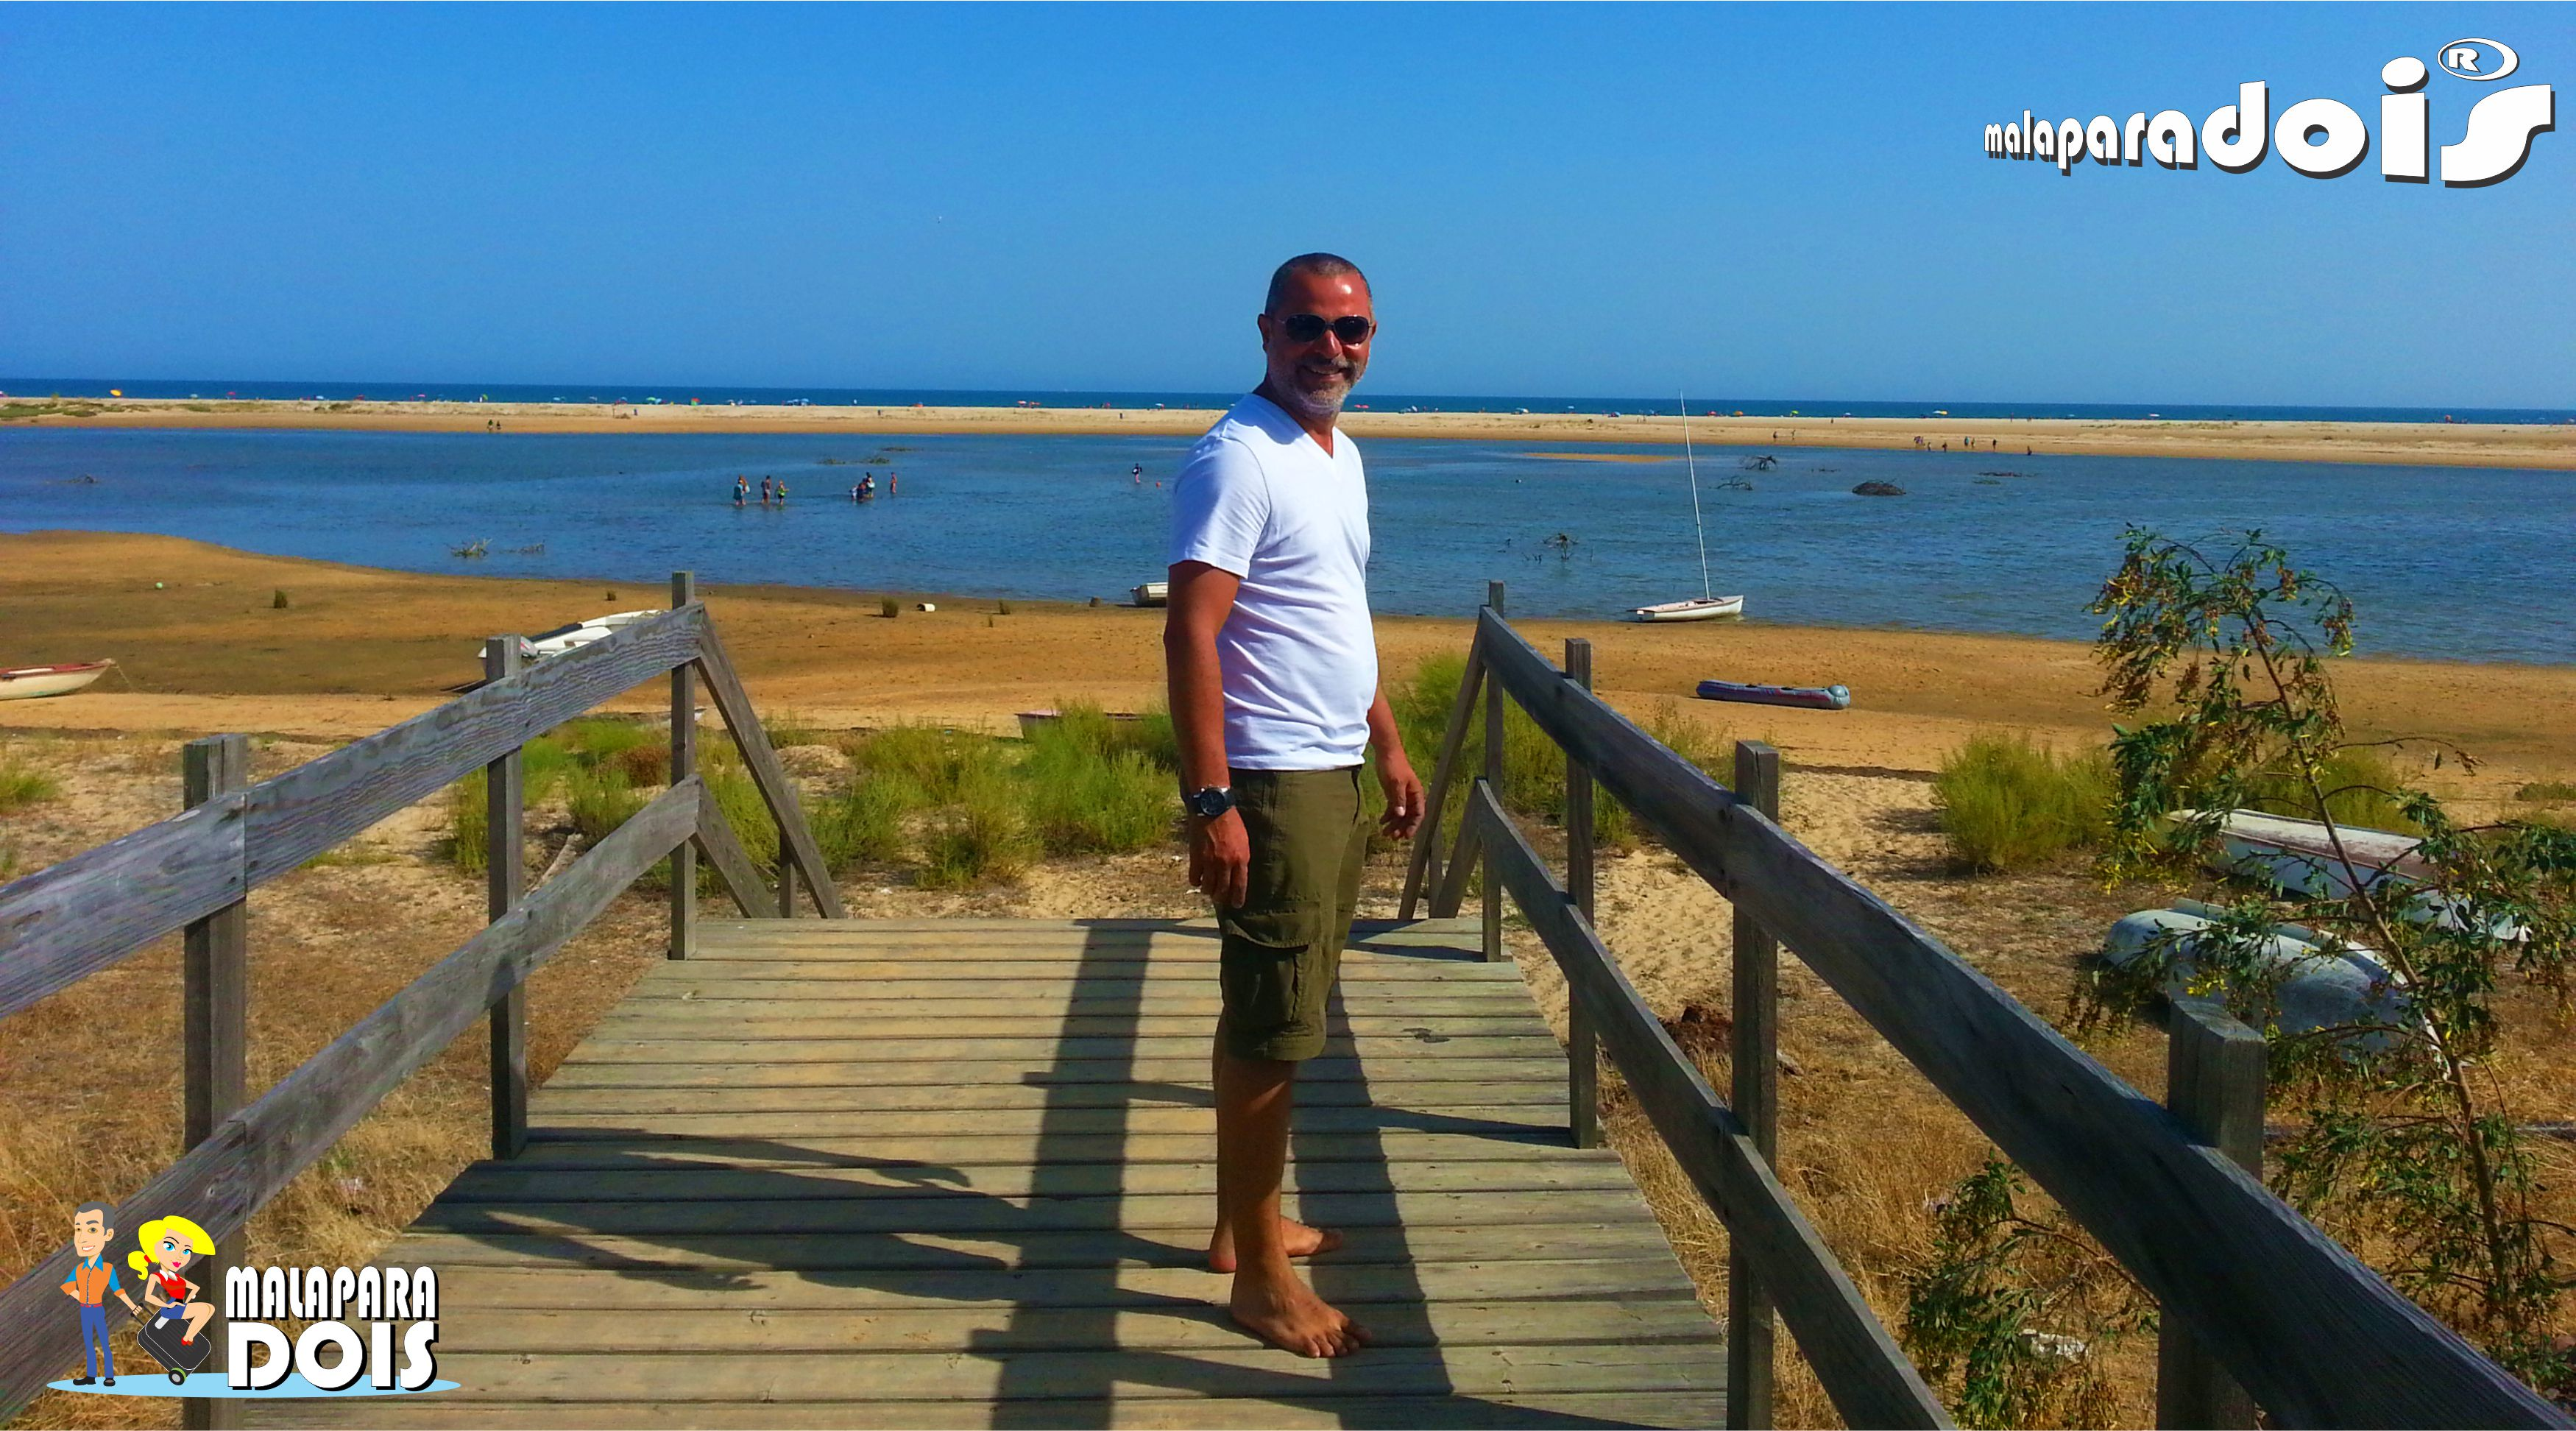 Fábrica - Algarve